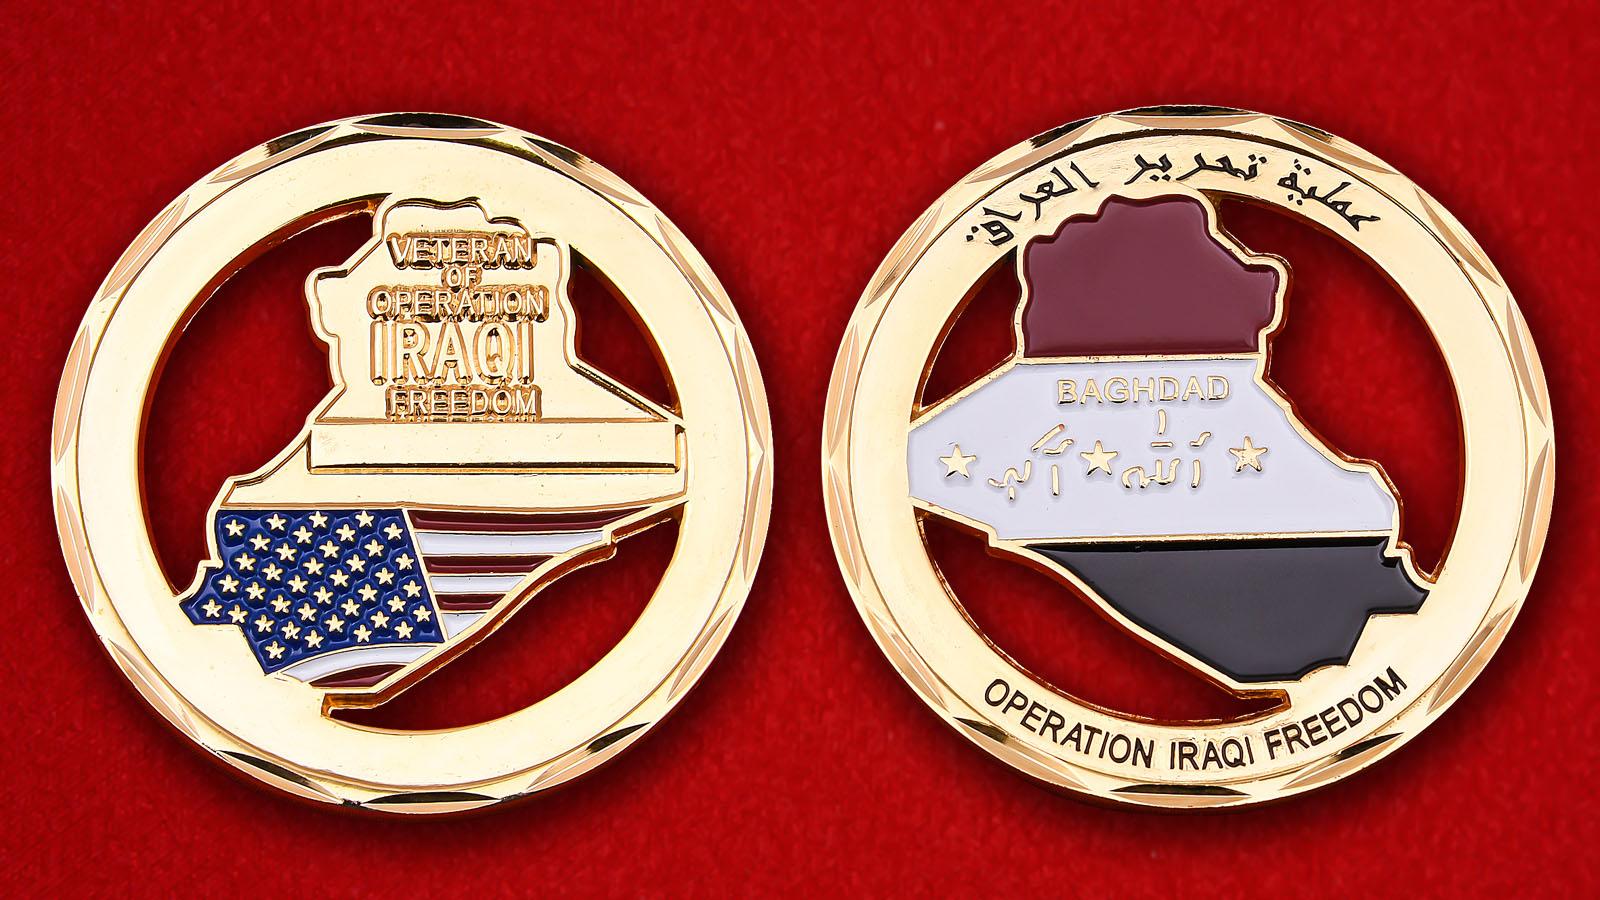 """Veteran of Operation Iraqi Freedom"" Challenge Coin"